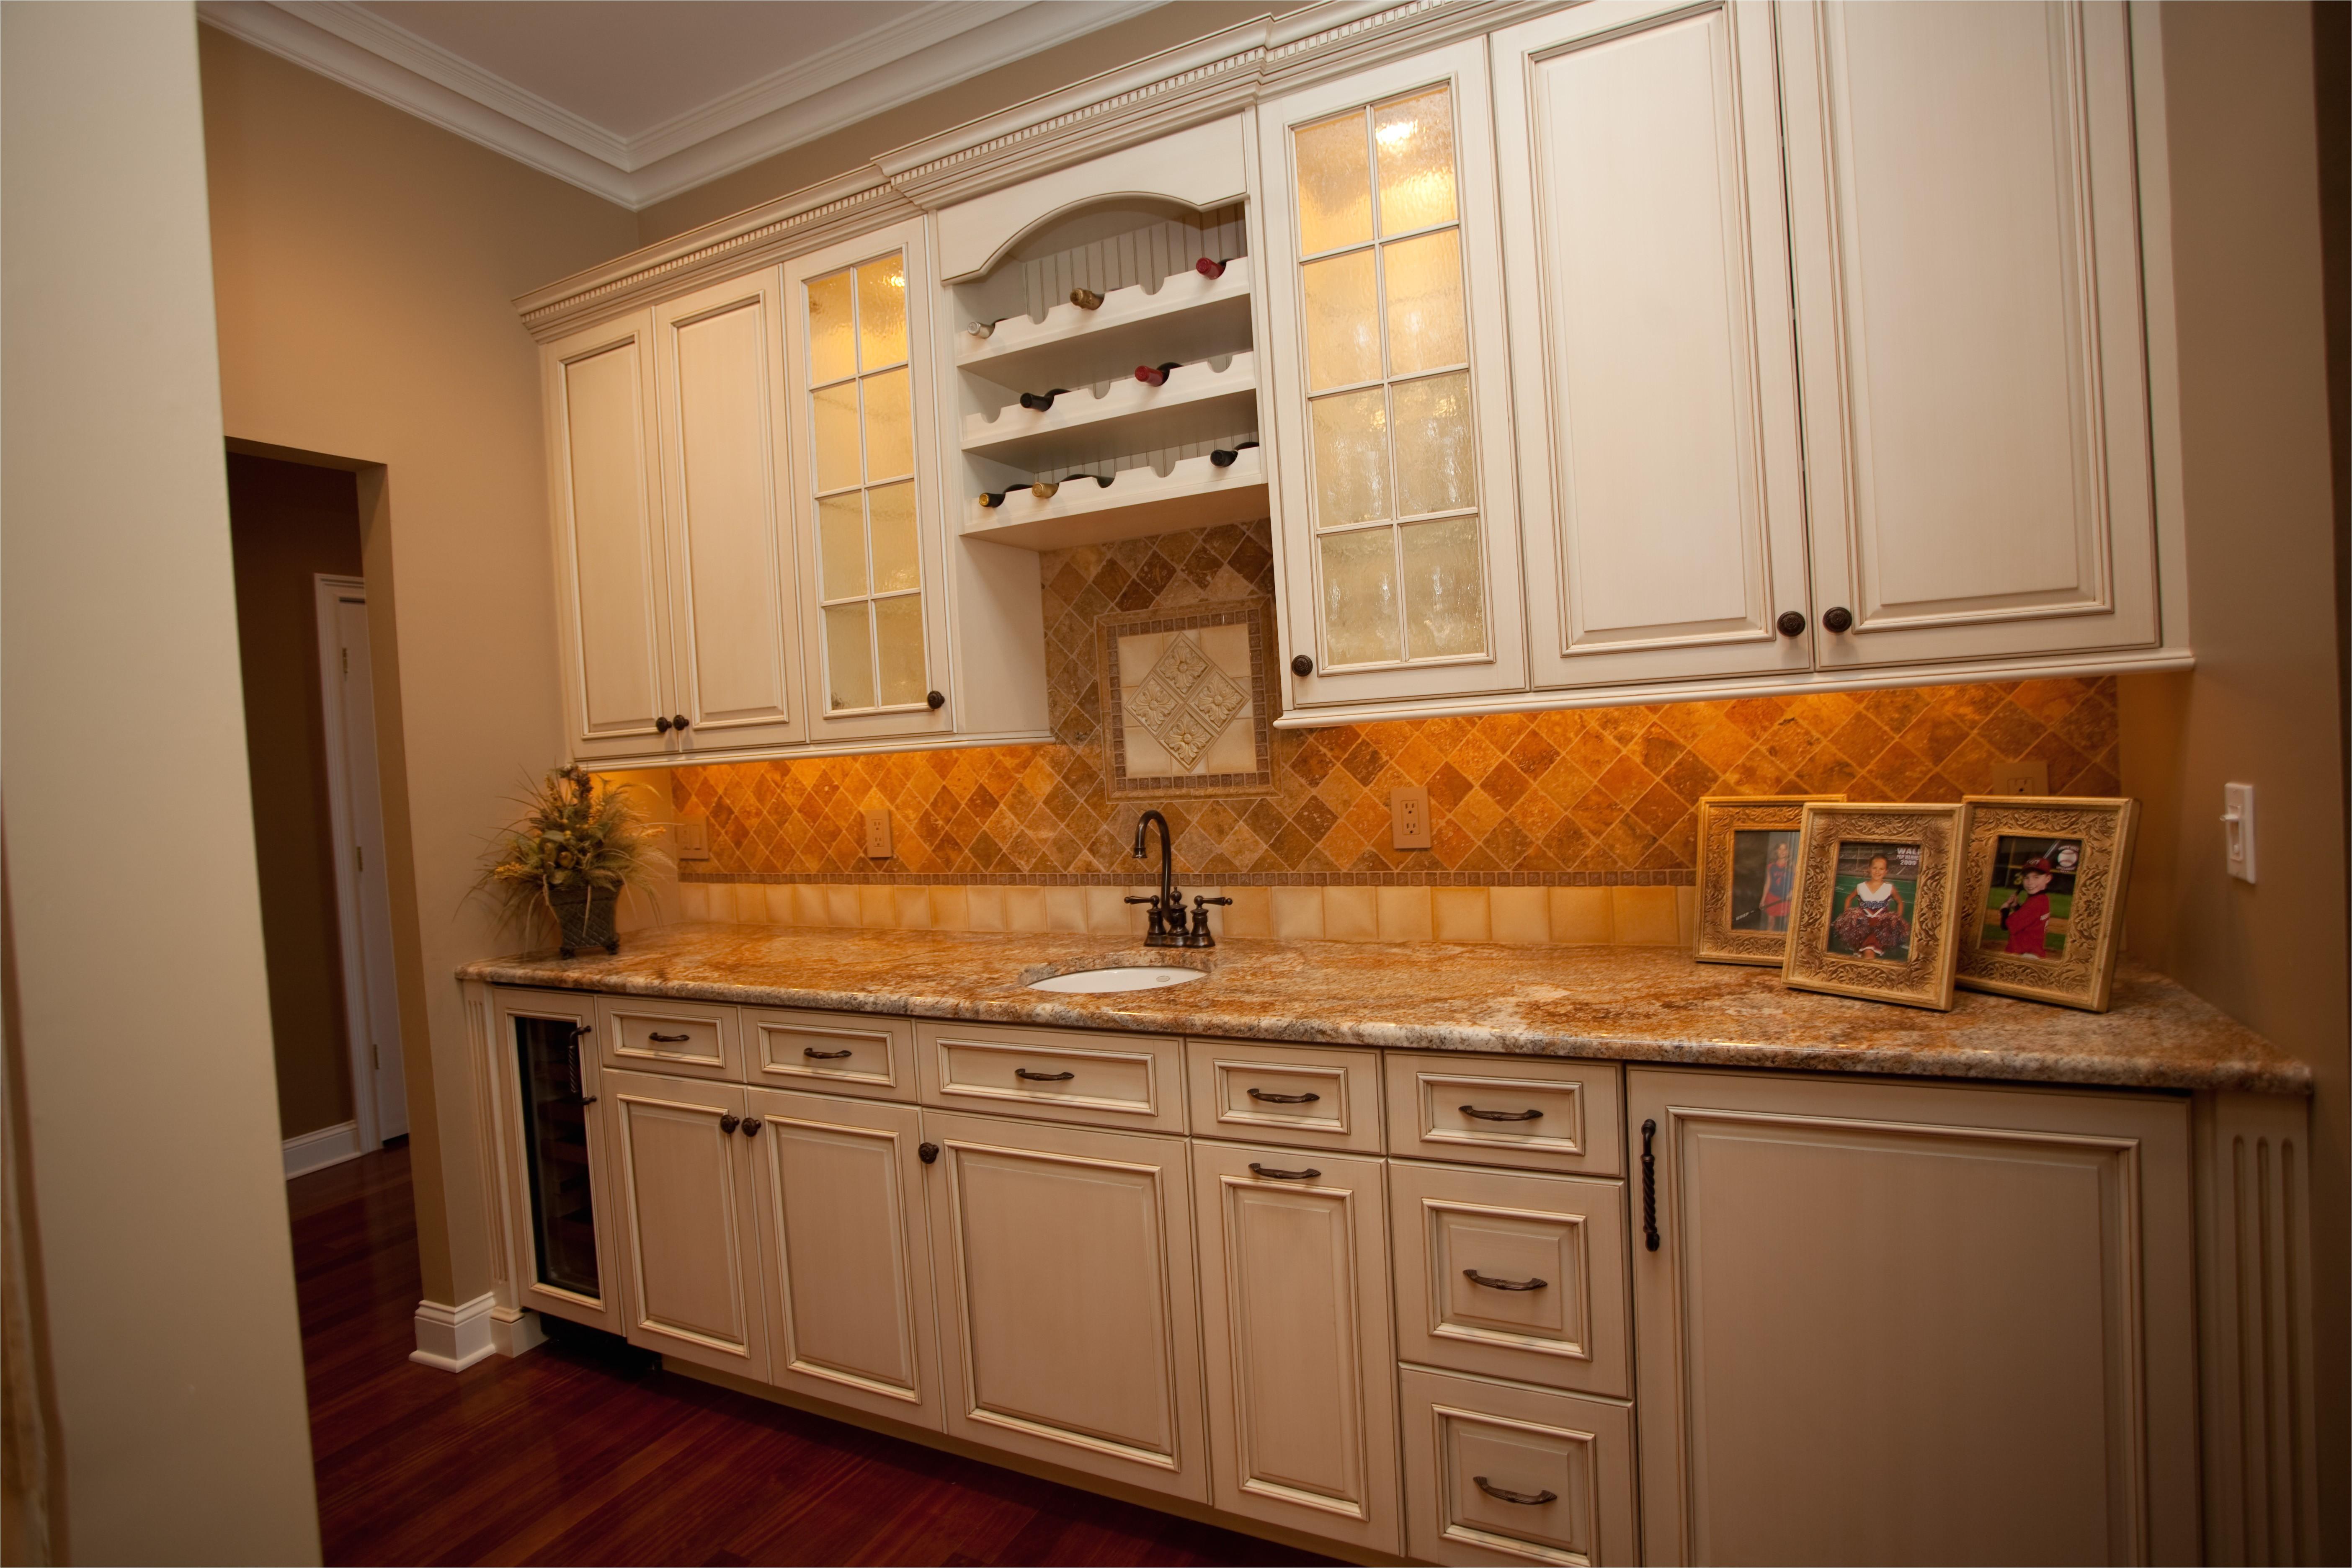 Home Wet Bar Plans Brannan Kitchen Manasquan Nj By Design Line - Design-line-kitchens